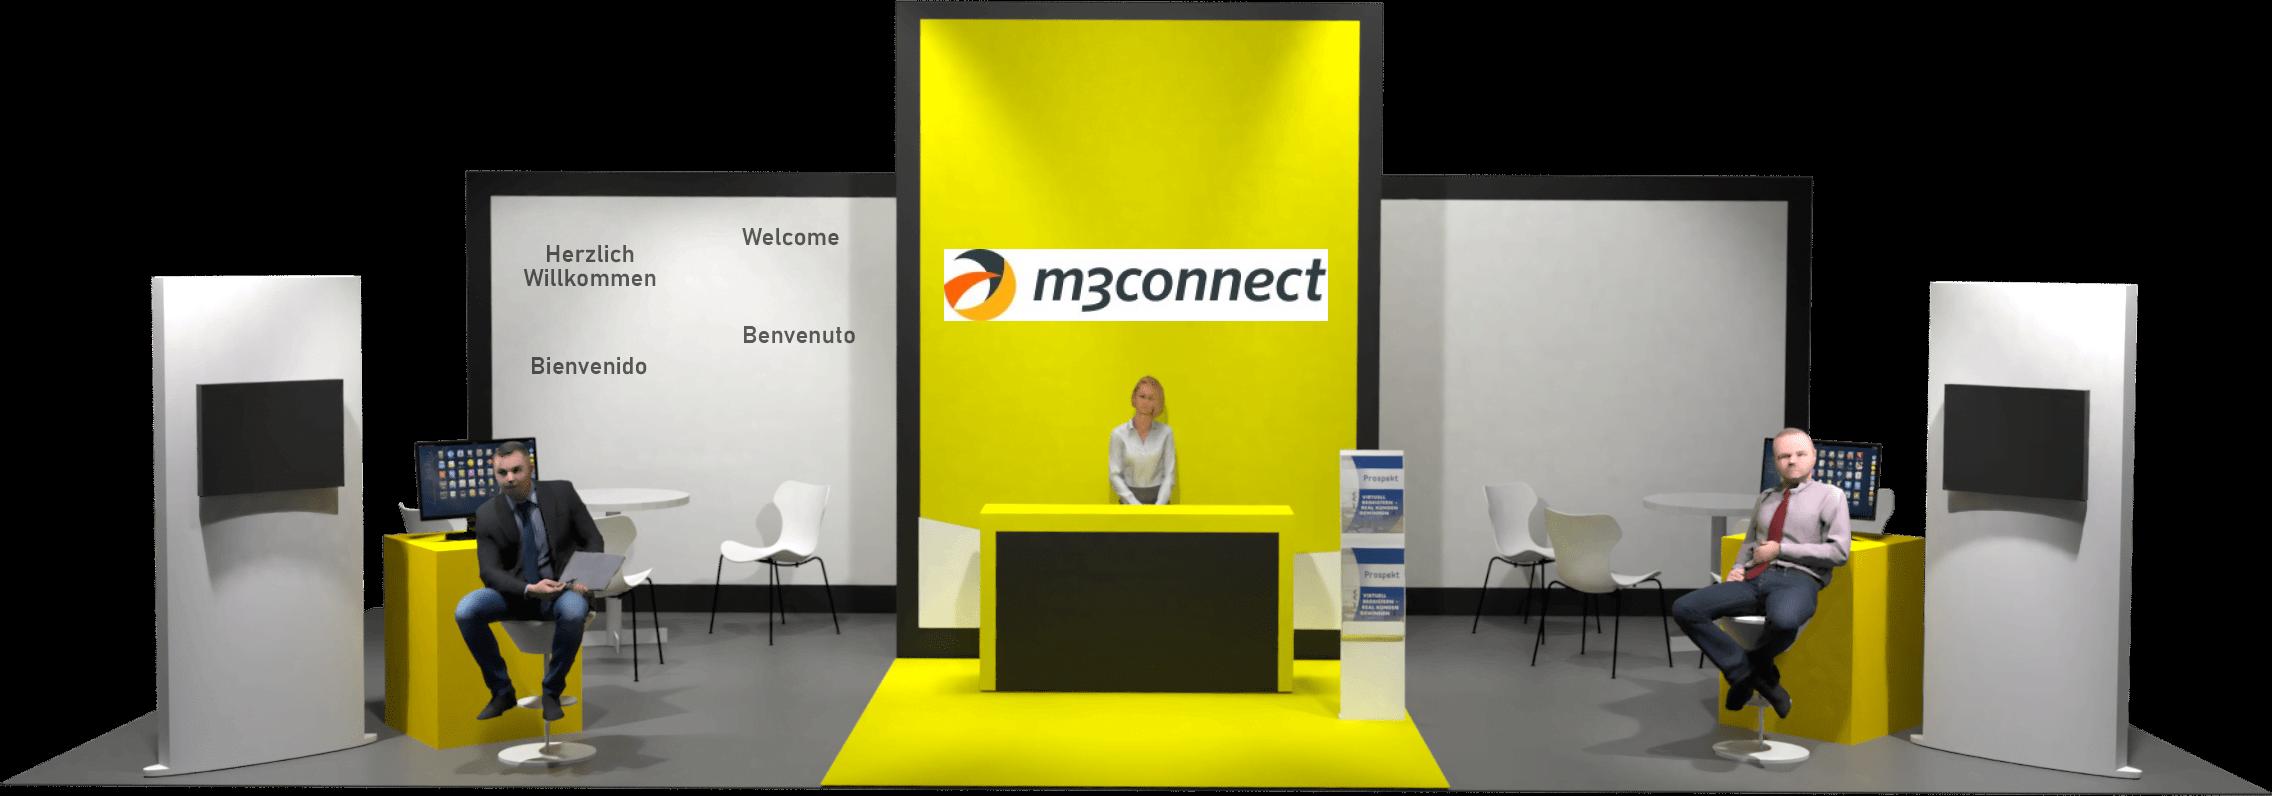 m3connect